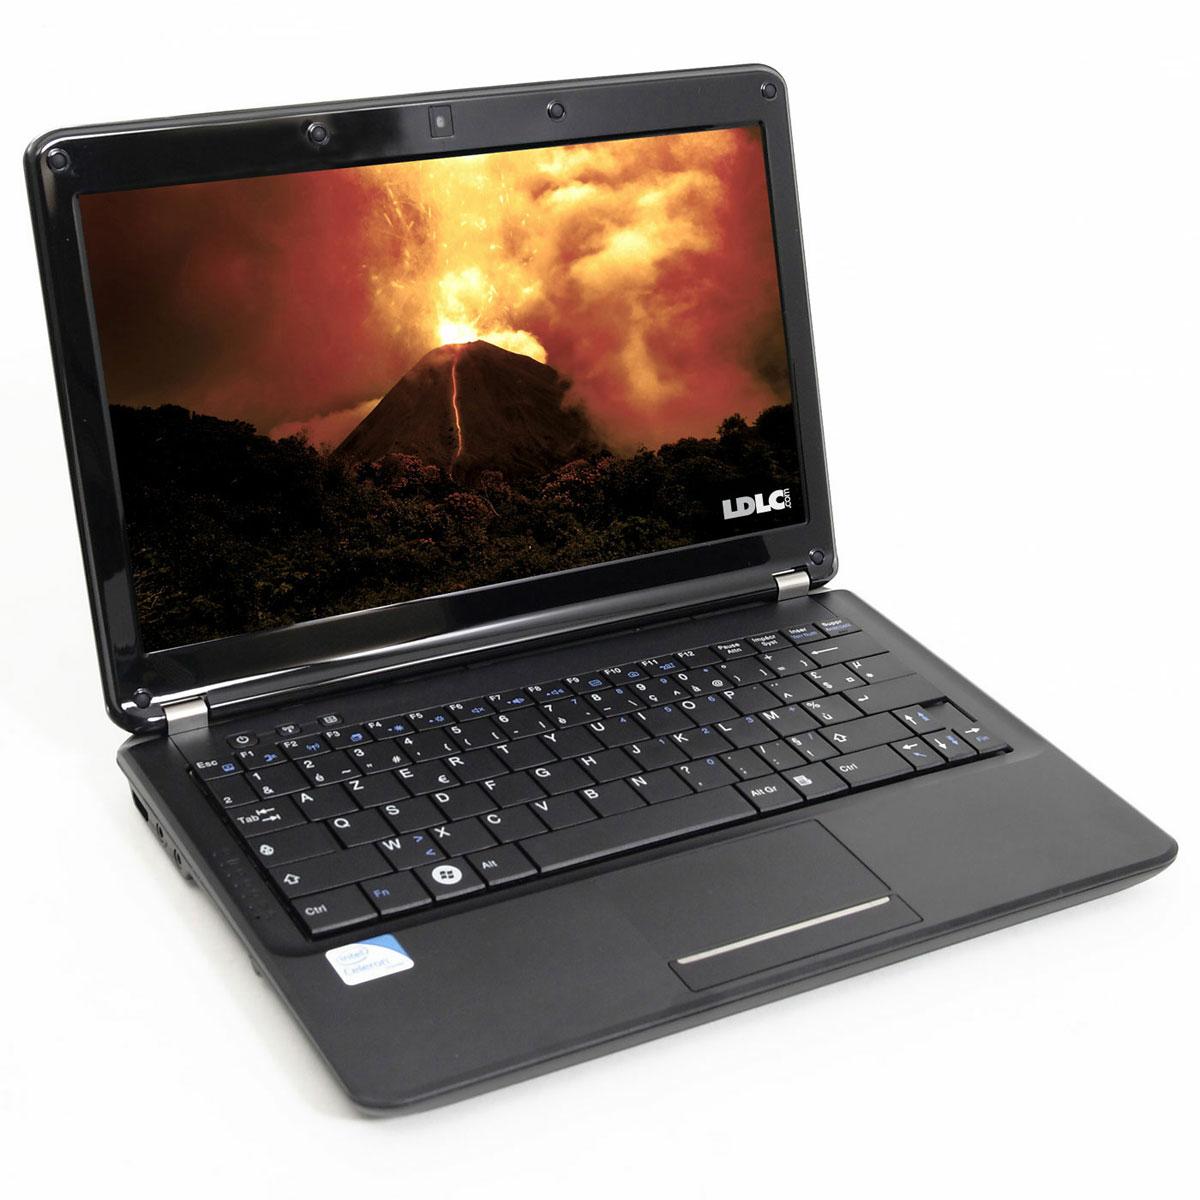 "PC portable LDLC Vulcain SM1-2-S8 Intel Celeron Dual-Core SU2300 2 Go SSD 80 Go 11.6"" LCD Wi-Fi N Webcam (sans OS)"